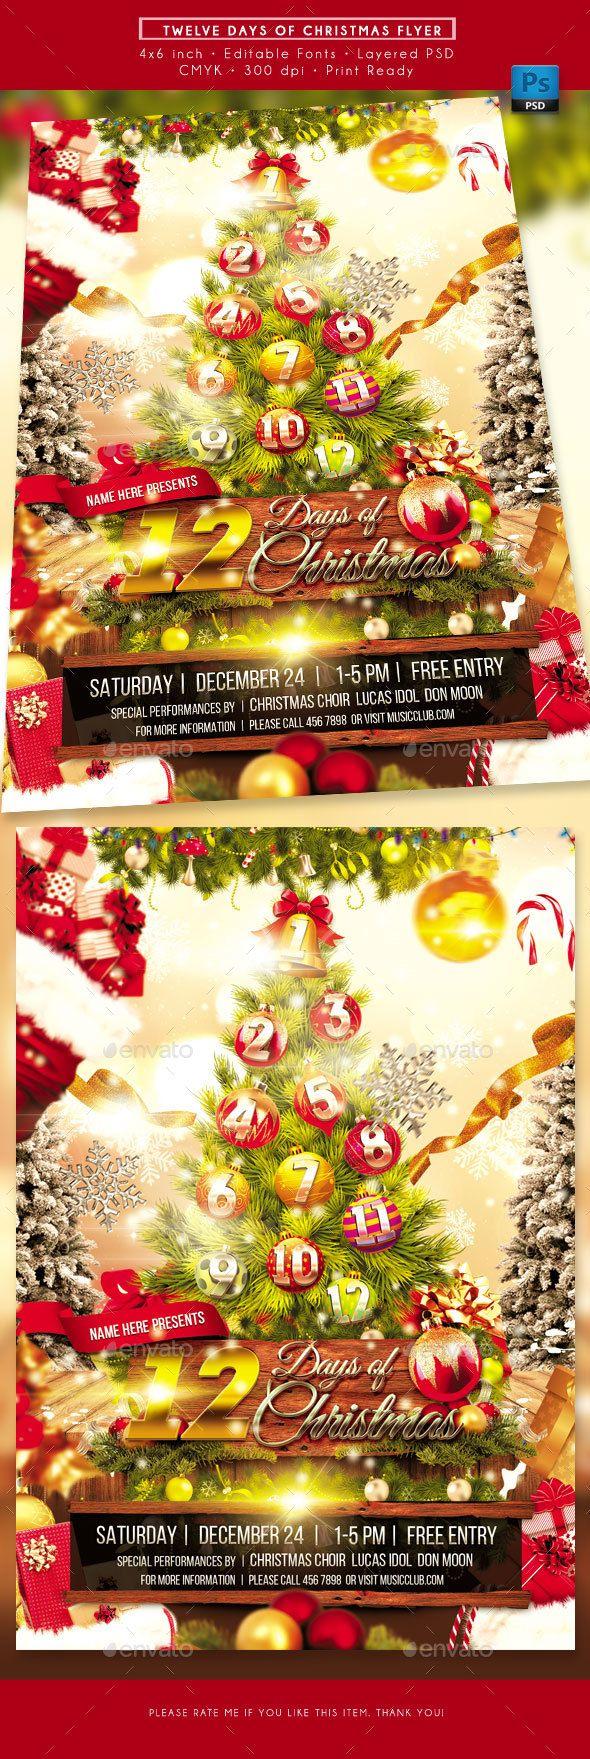 Twelve Days Of Christmas Flyer Christmas Flyer Twelve Days Of Christmas Holiday Flyer Template